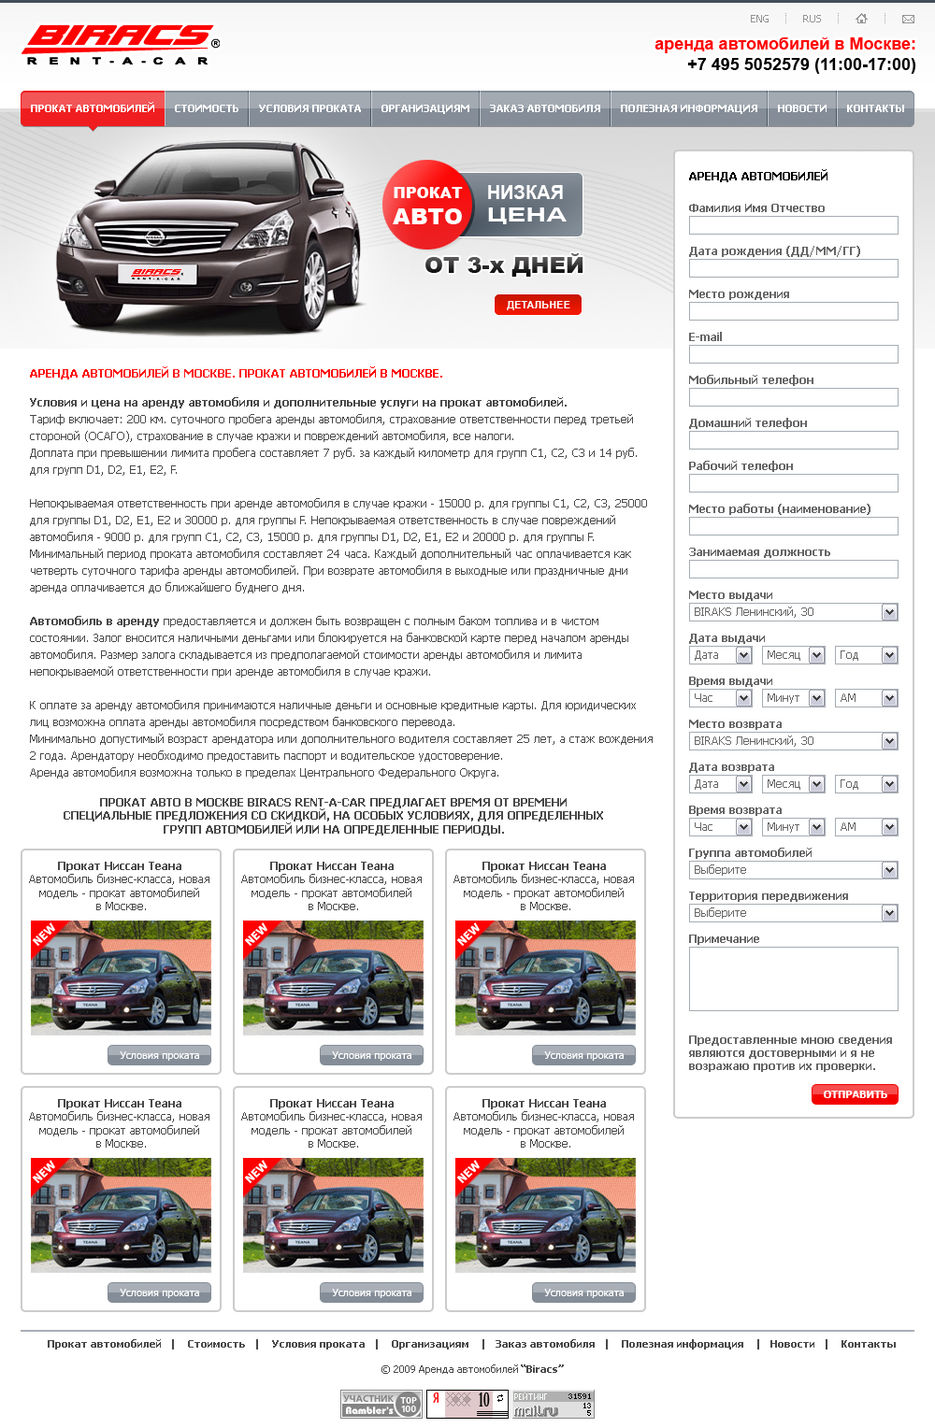 аренда авто в москве на месяц летних